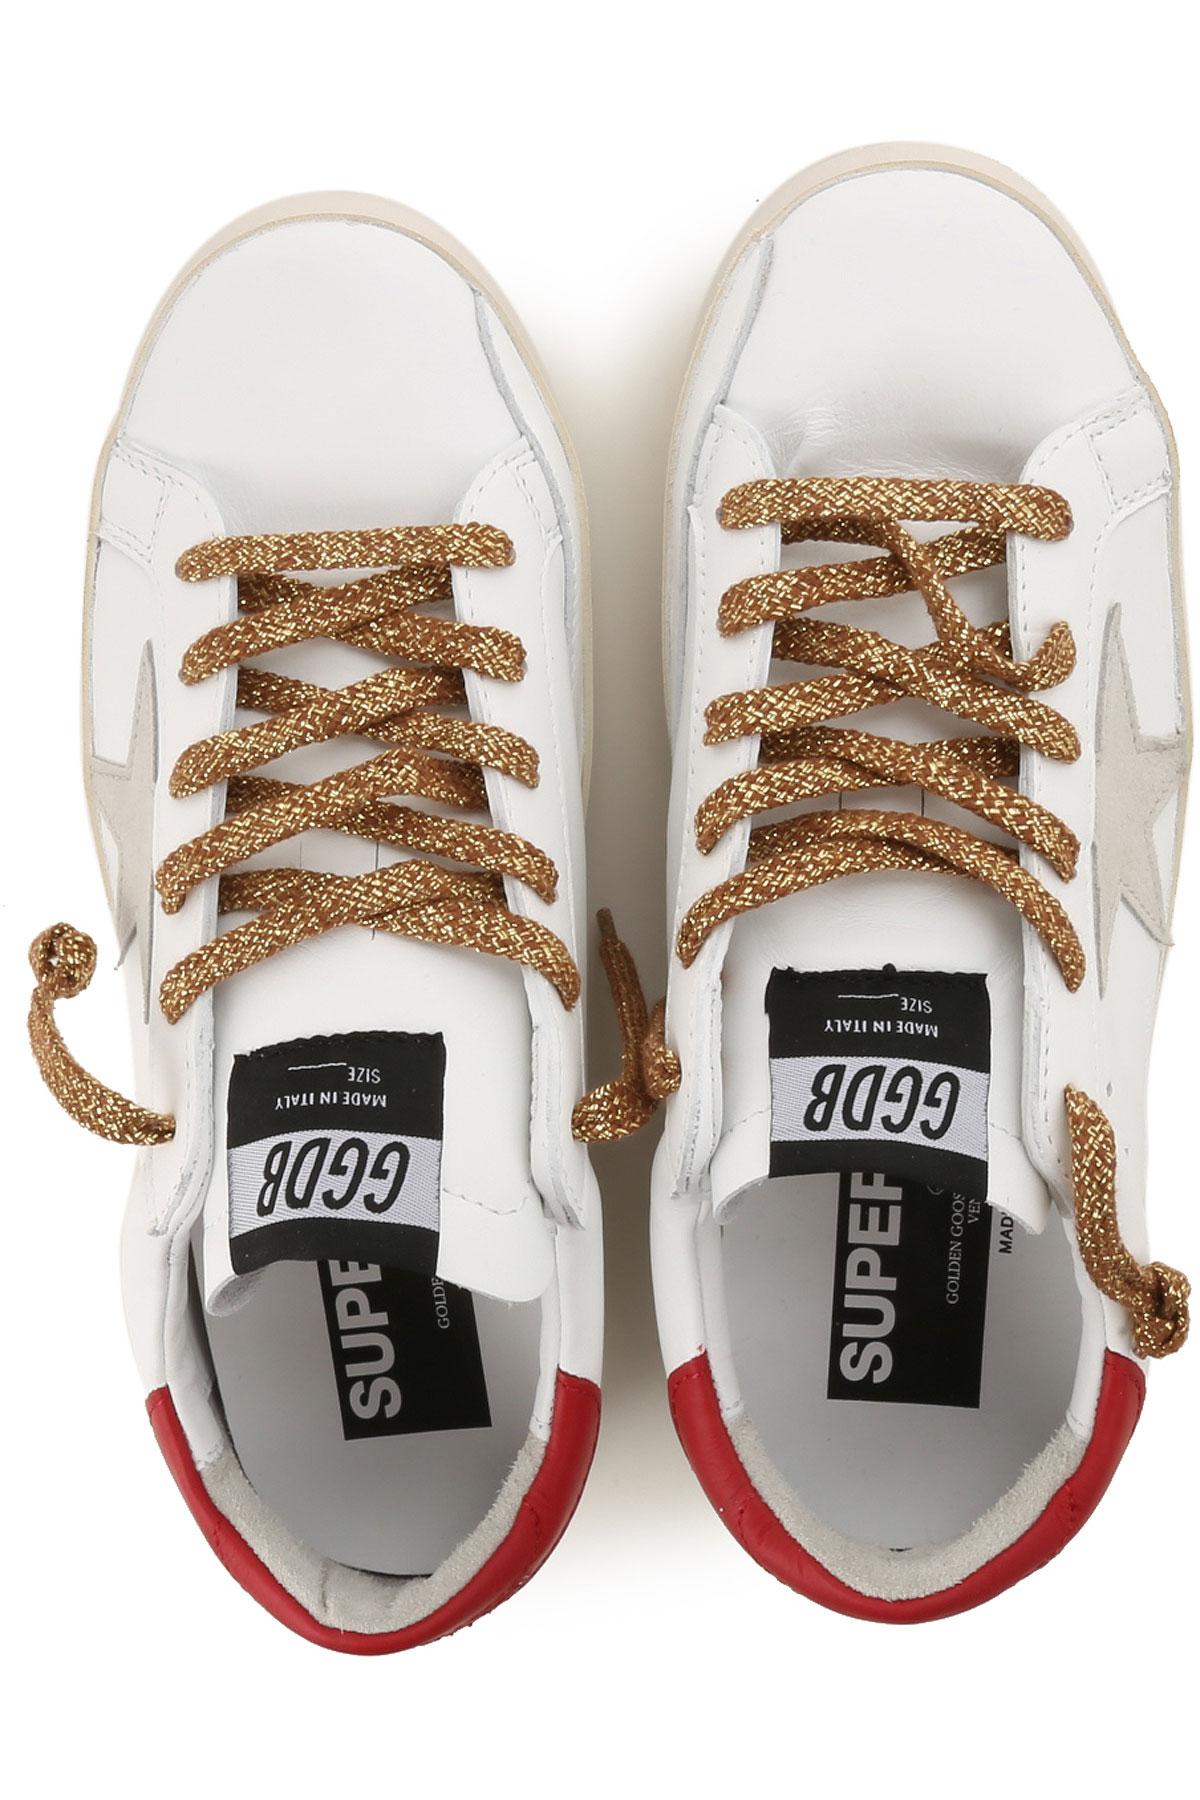 Blanco Zapatos Goose Rojo Golden verano Para Mujer 2019 Primavera vFqqS5wB